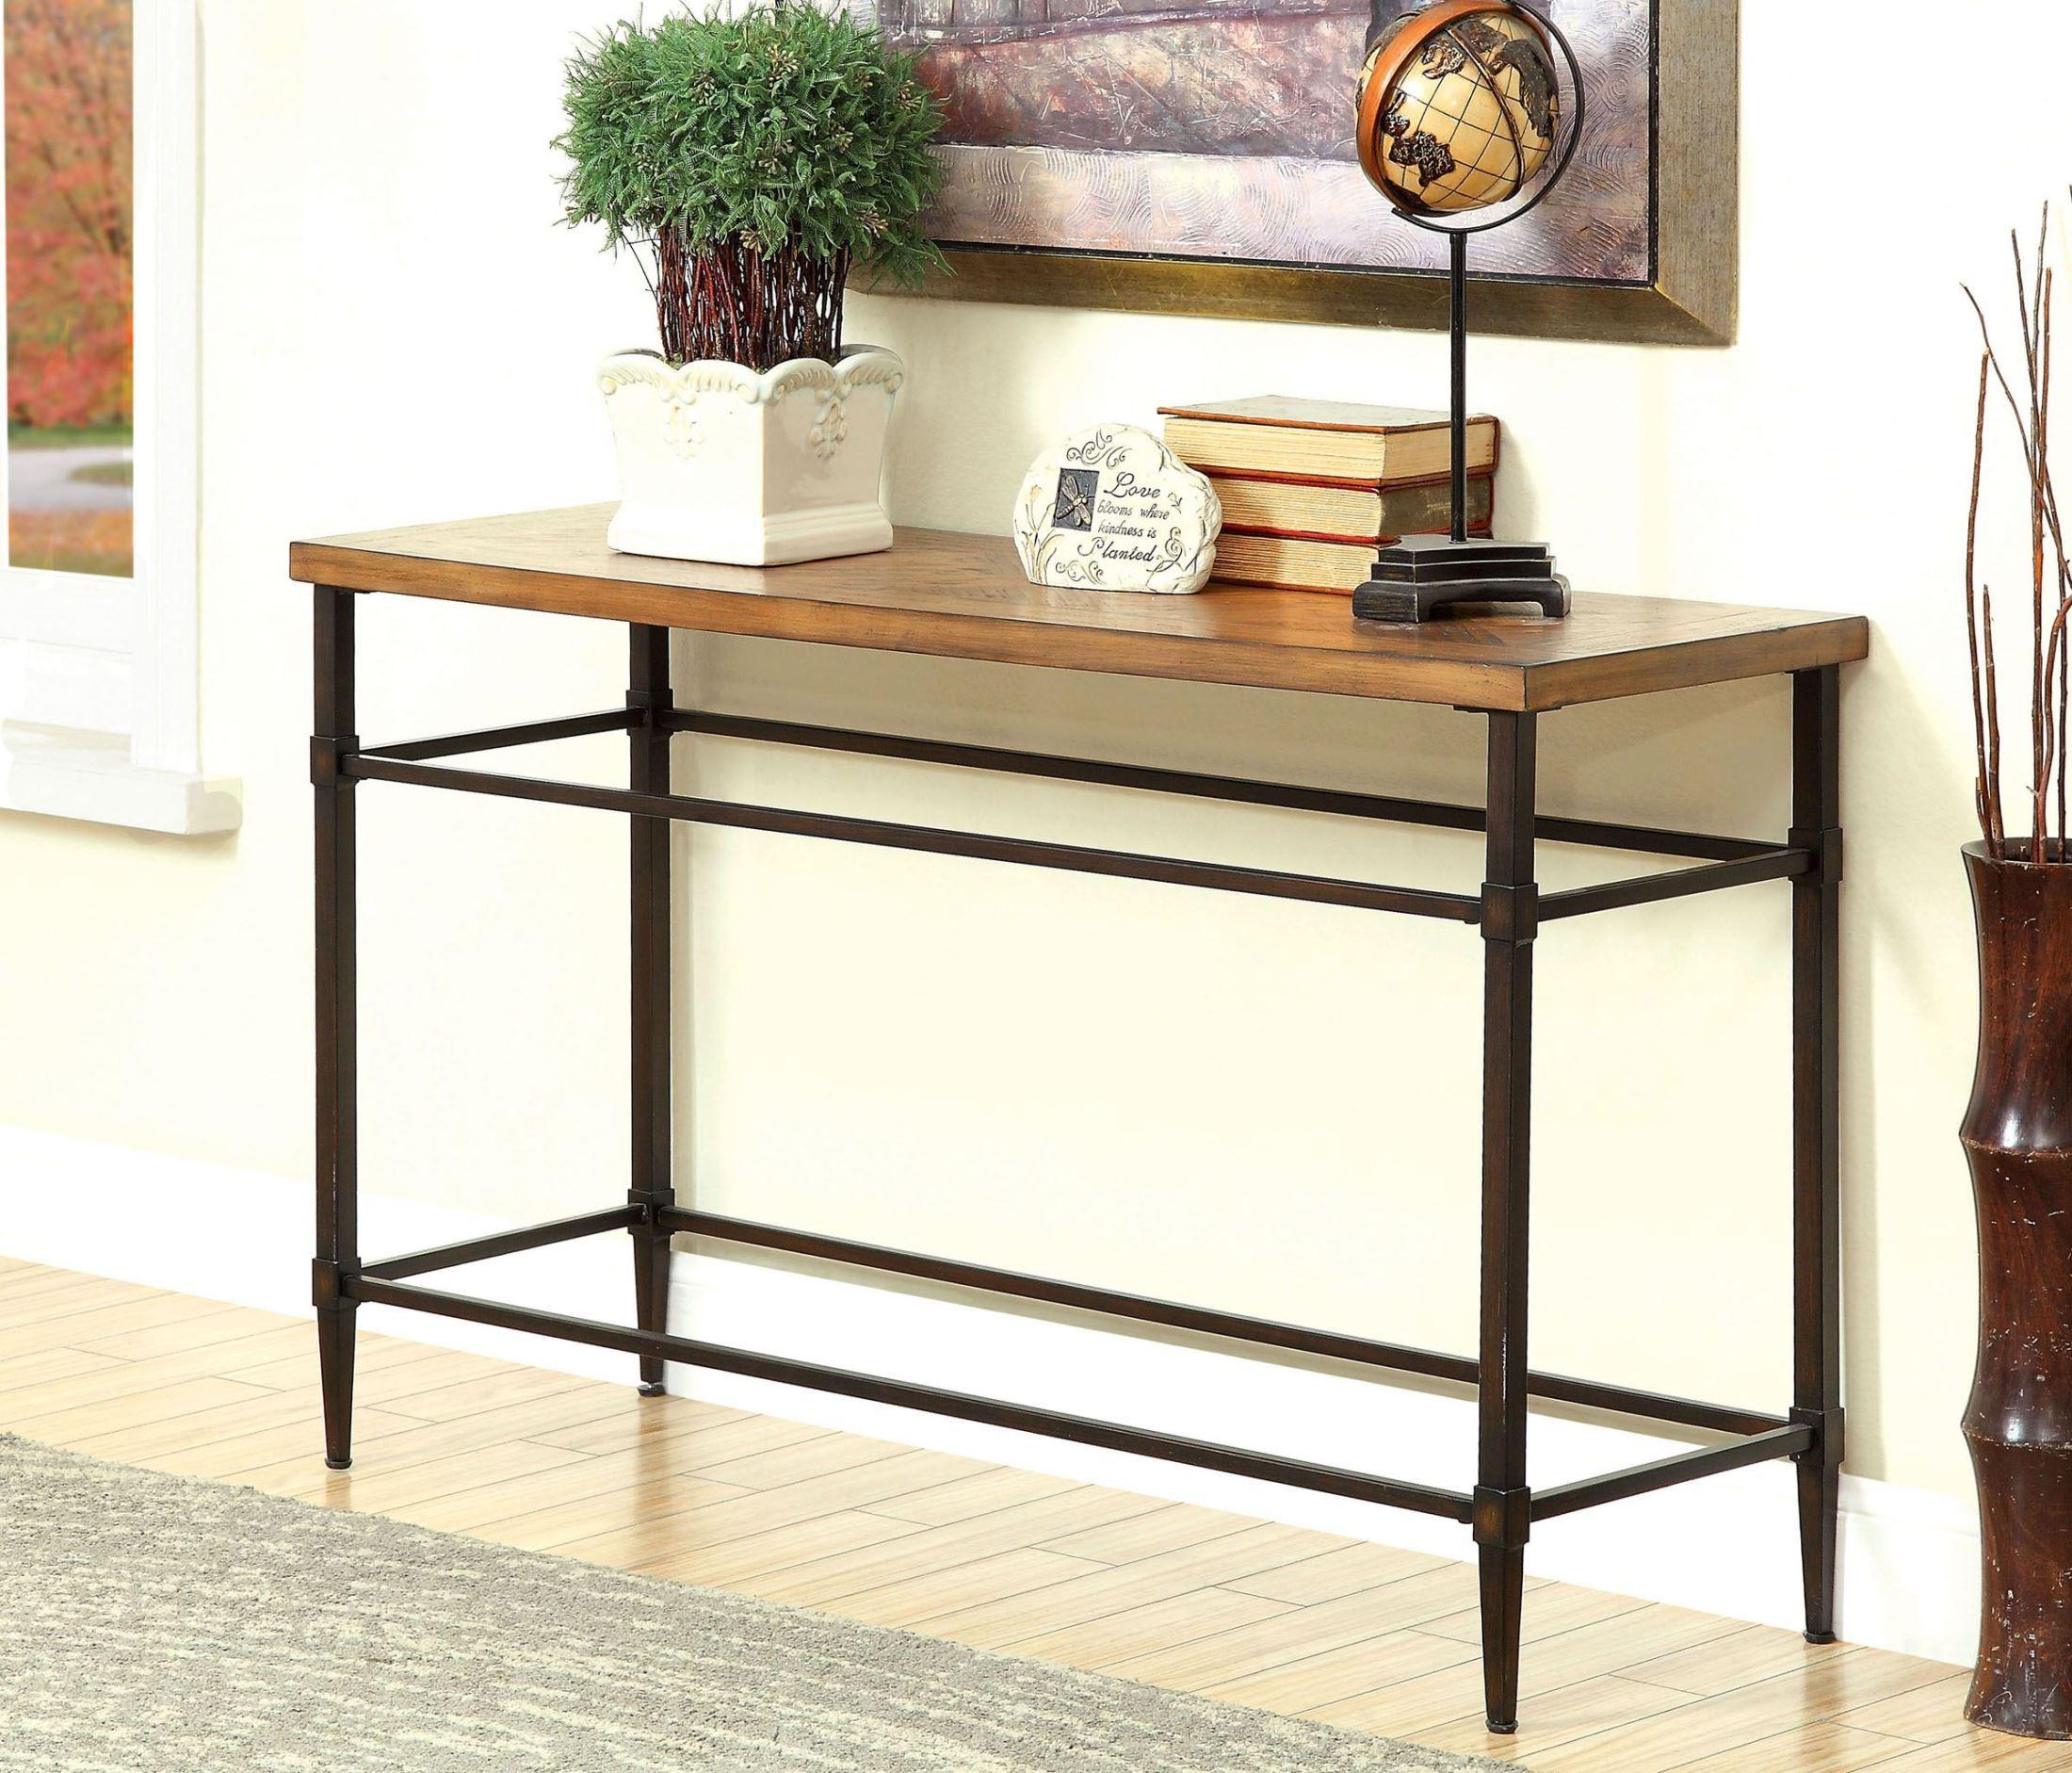 Herrick light oak sofa table from furniture of america